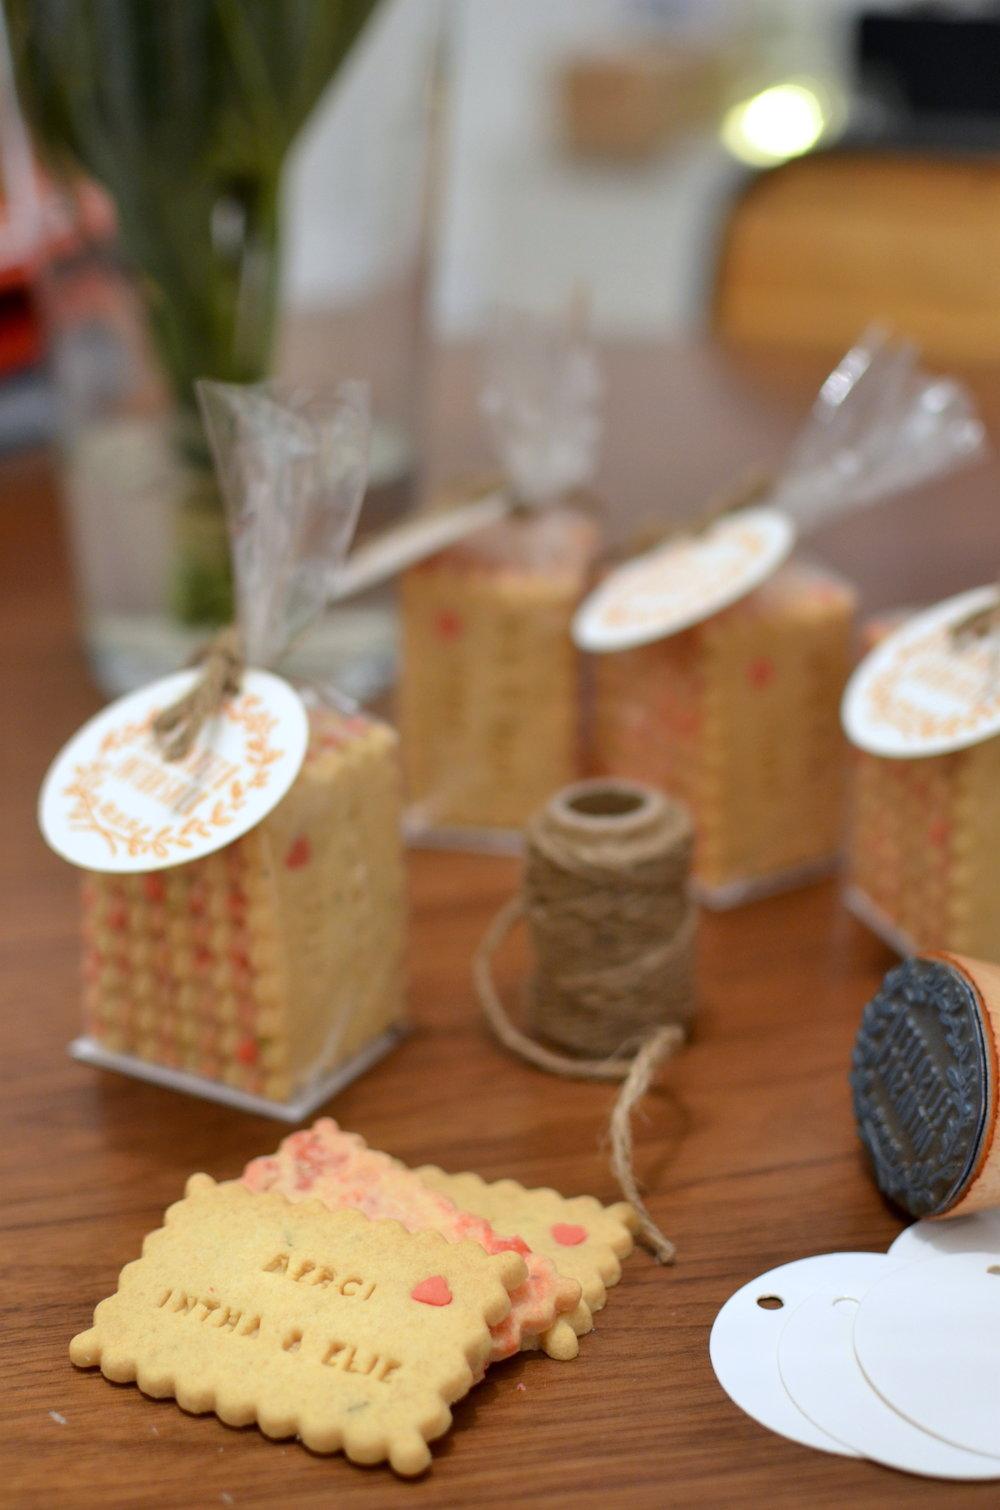 twinky lizzy blog aix en provence - shanty biscuits 01.jpg